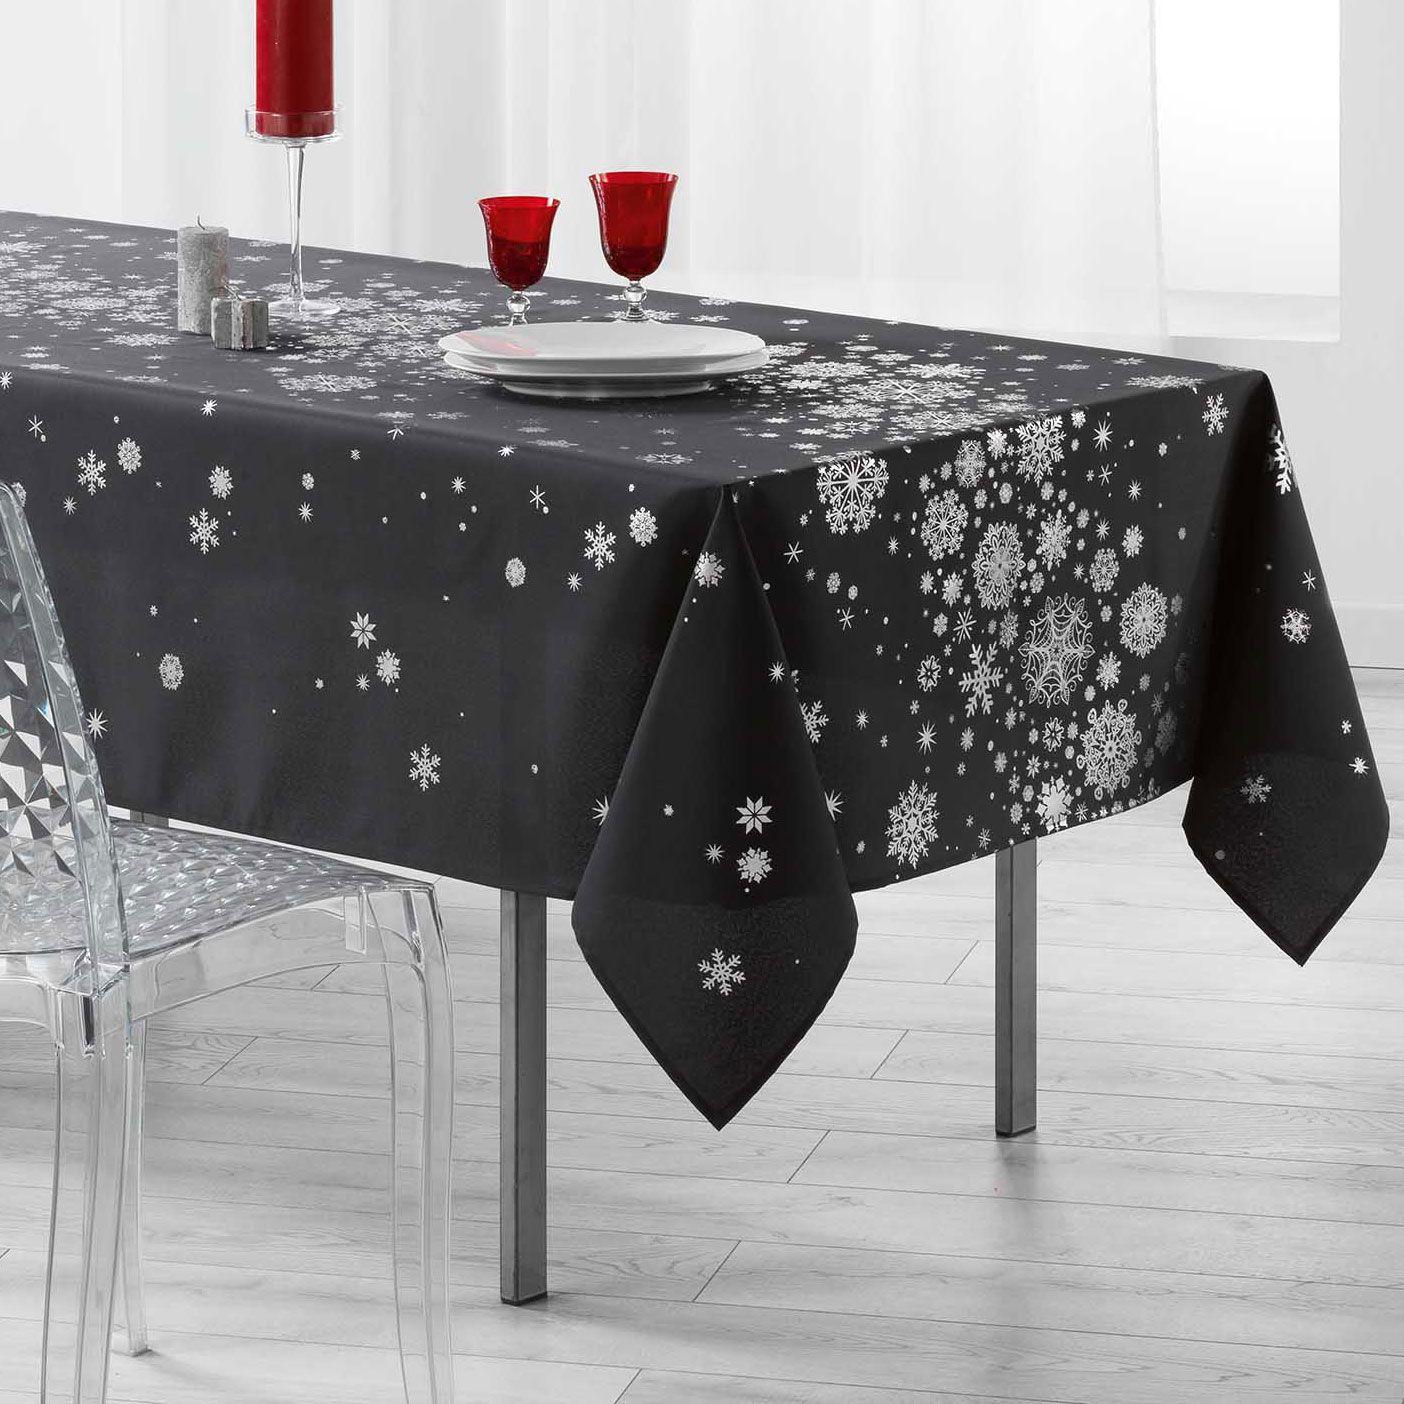 nappe rectangulaire 240 cm constellation gris anthracite linge de table eminza. Black Bedroom Furniture Sets. Home Design Ideas